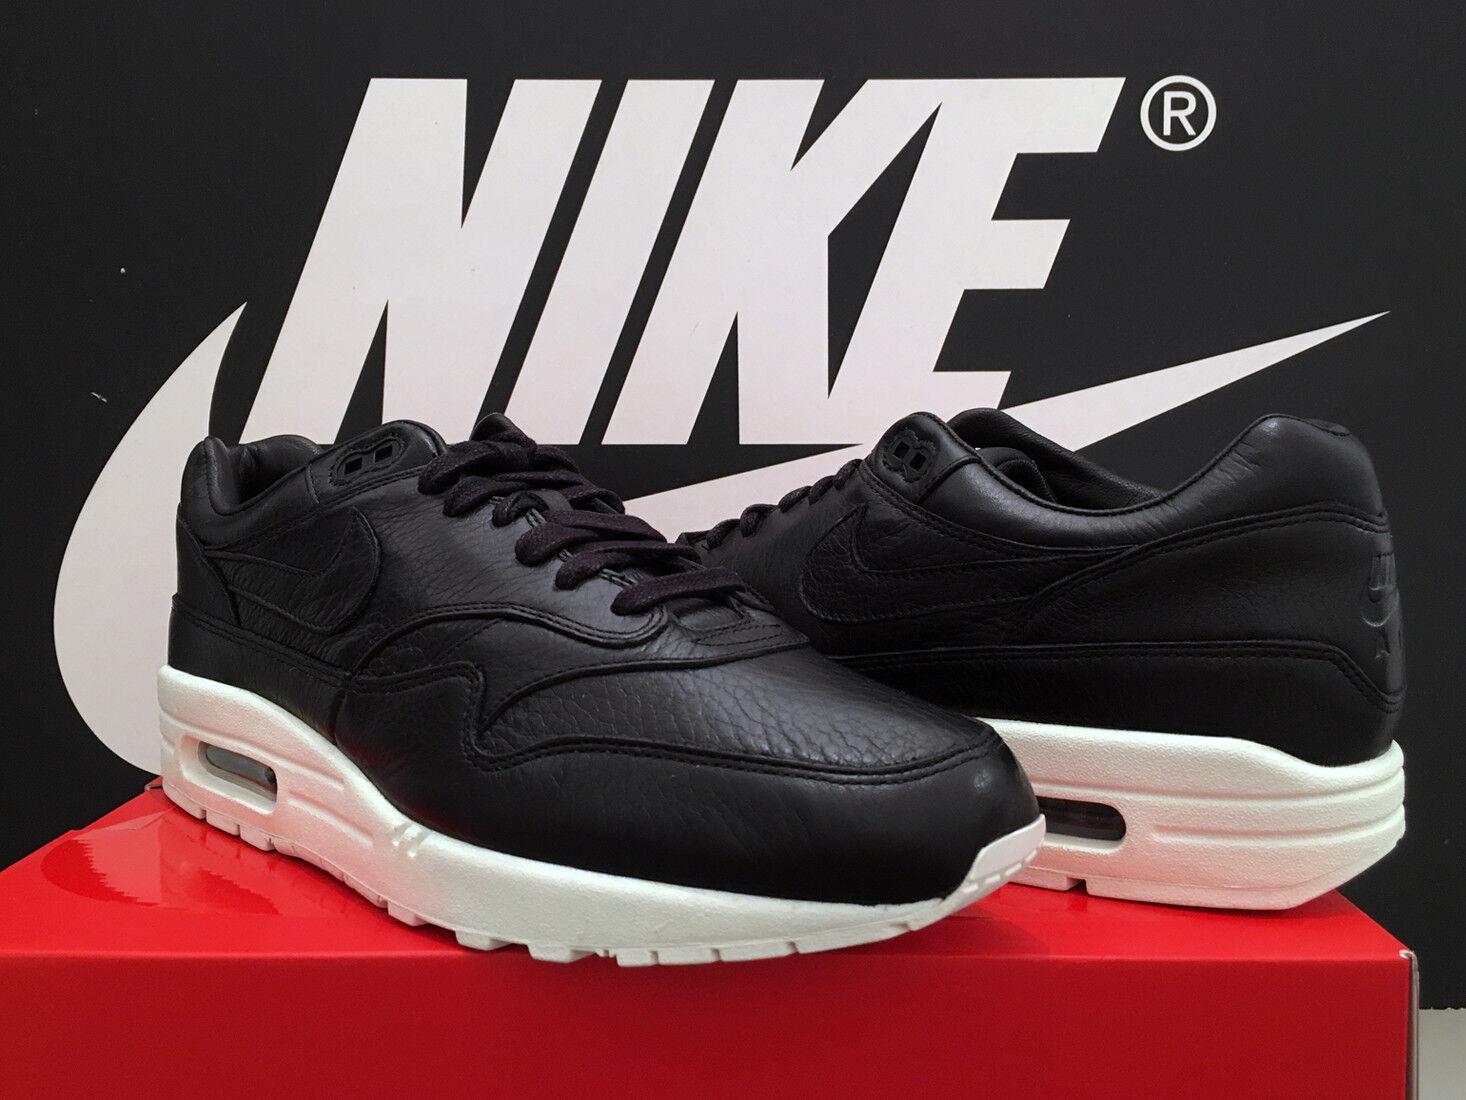 DS DS DS 2017 NikeLab AIR MAX 1 Pinnacle UK10 EU45 Nero mi BW 180 95 TN bianco sporco RARO | Eccellente  Qualità  | Uomini/Donna Scarpa  b3b024